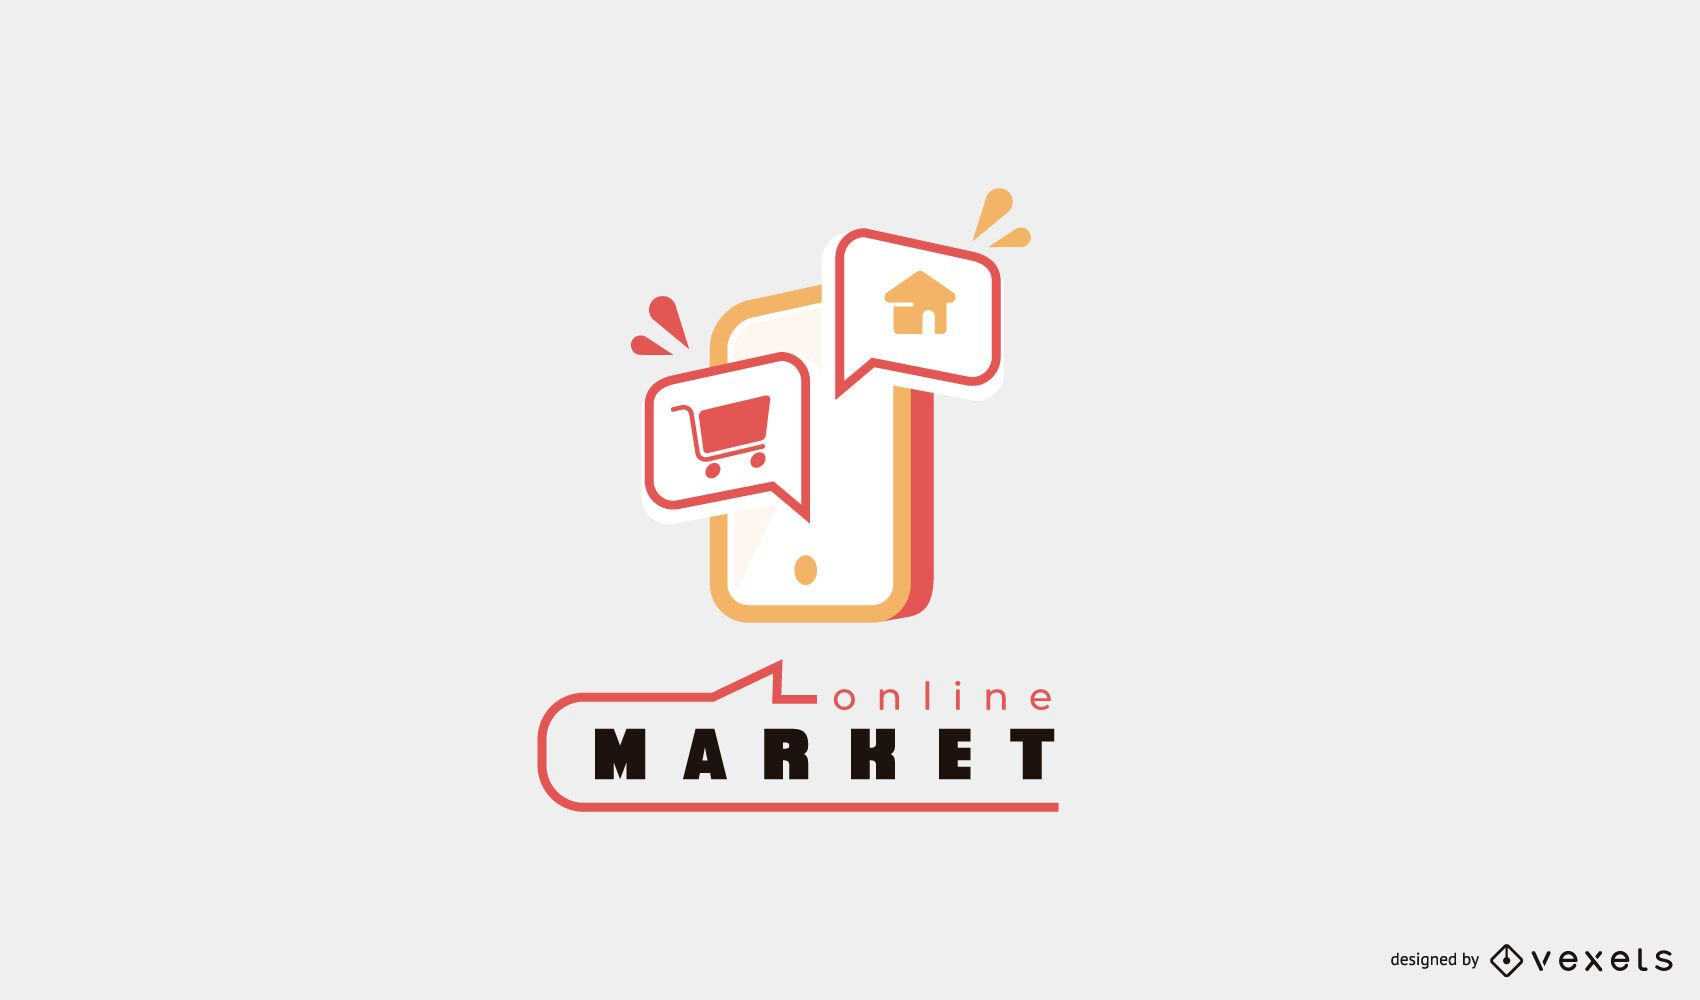 Diseño de logotipo de teléfono de mercado en línea